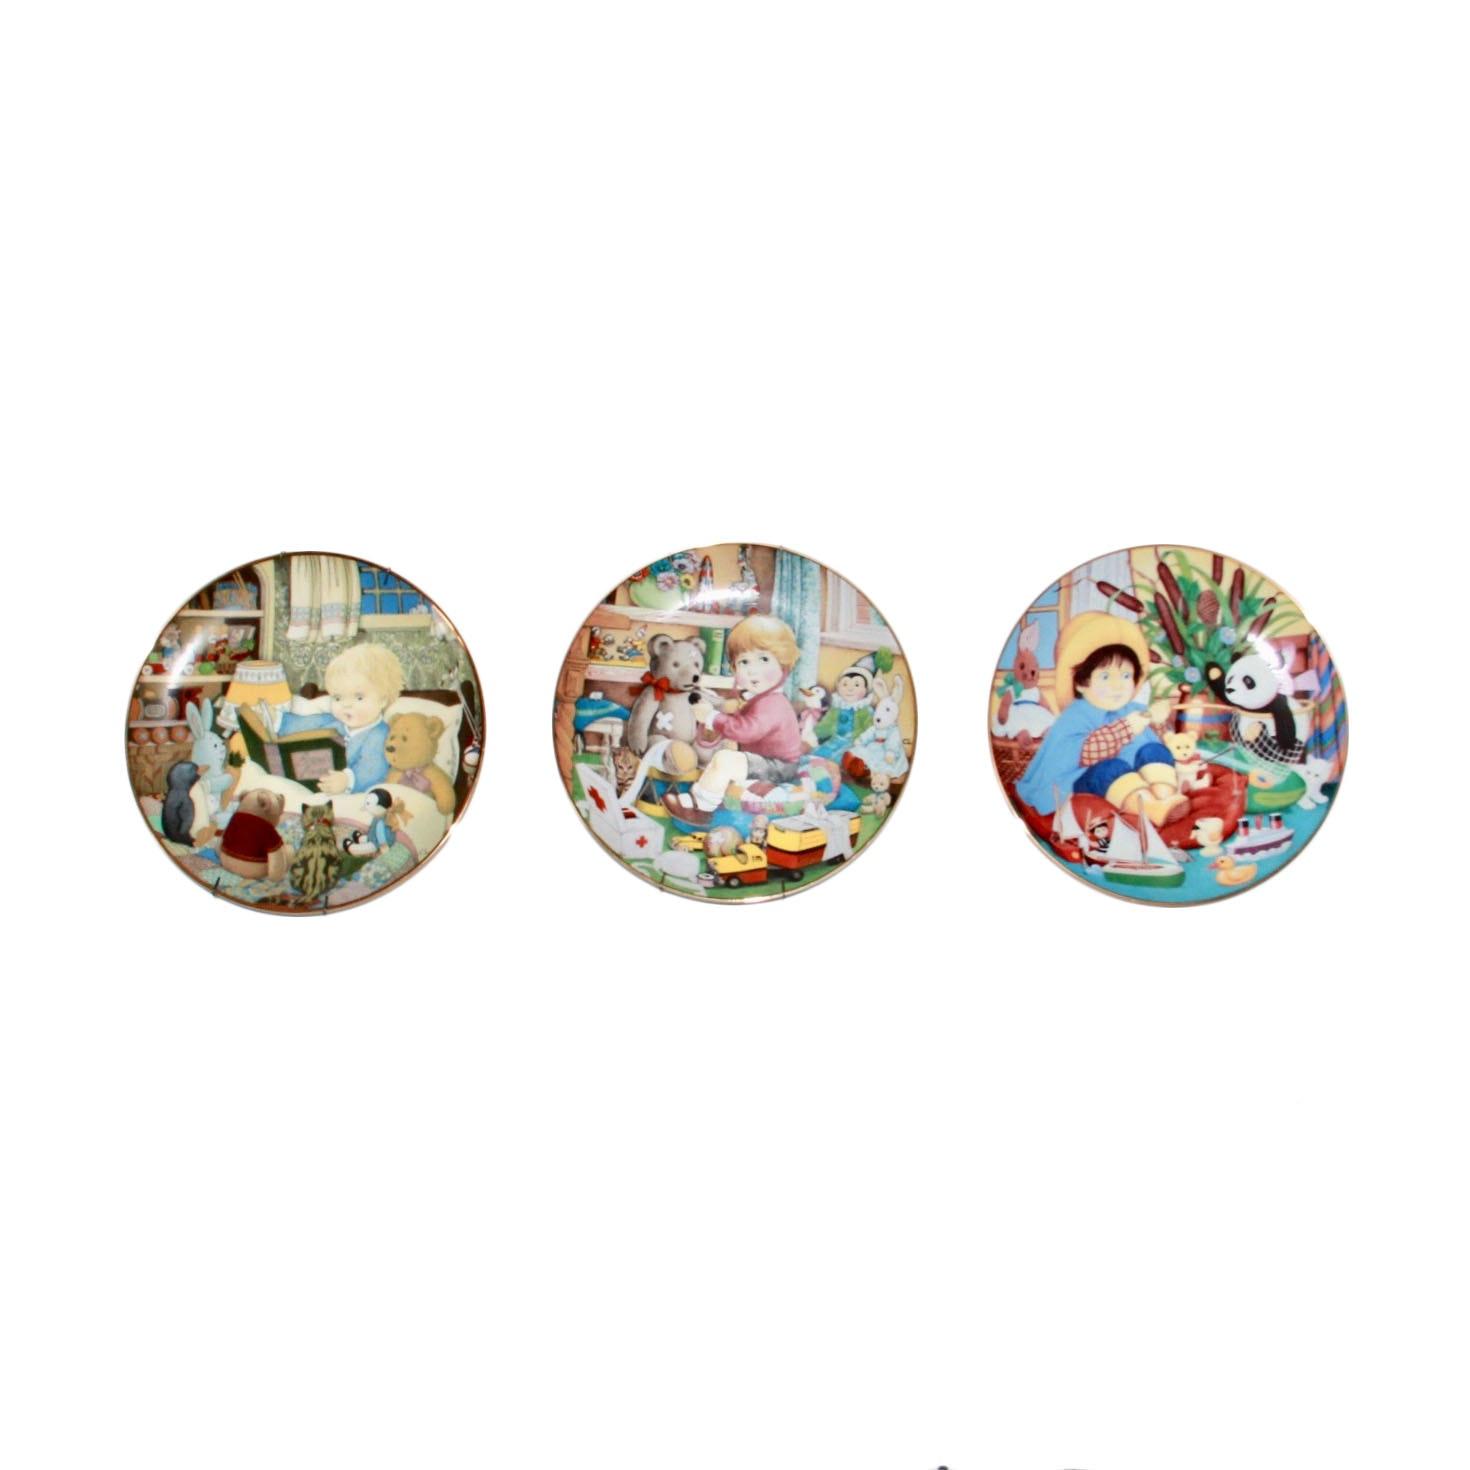 Carol Lawson Collector's Plates